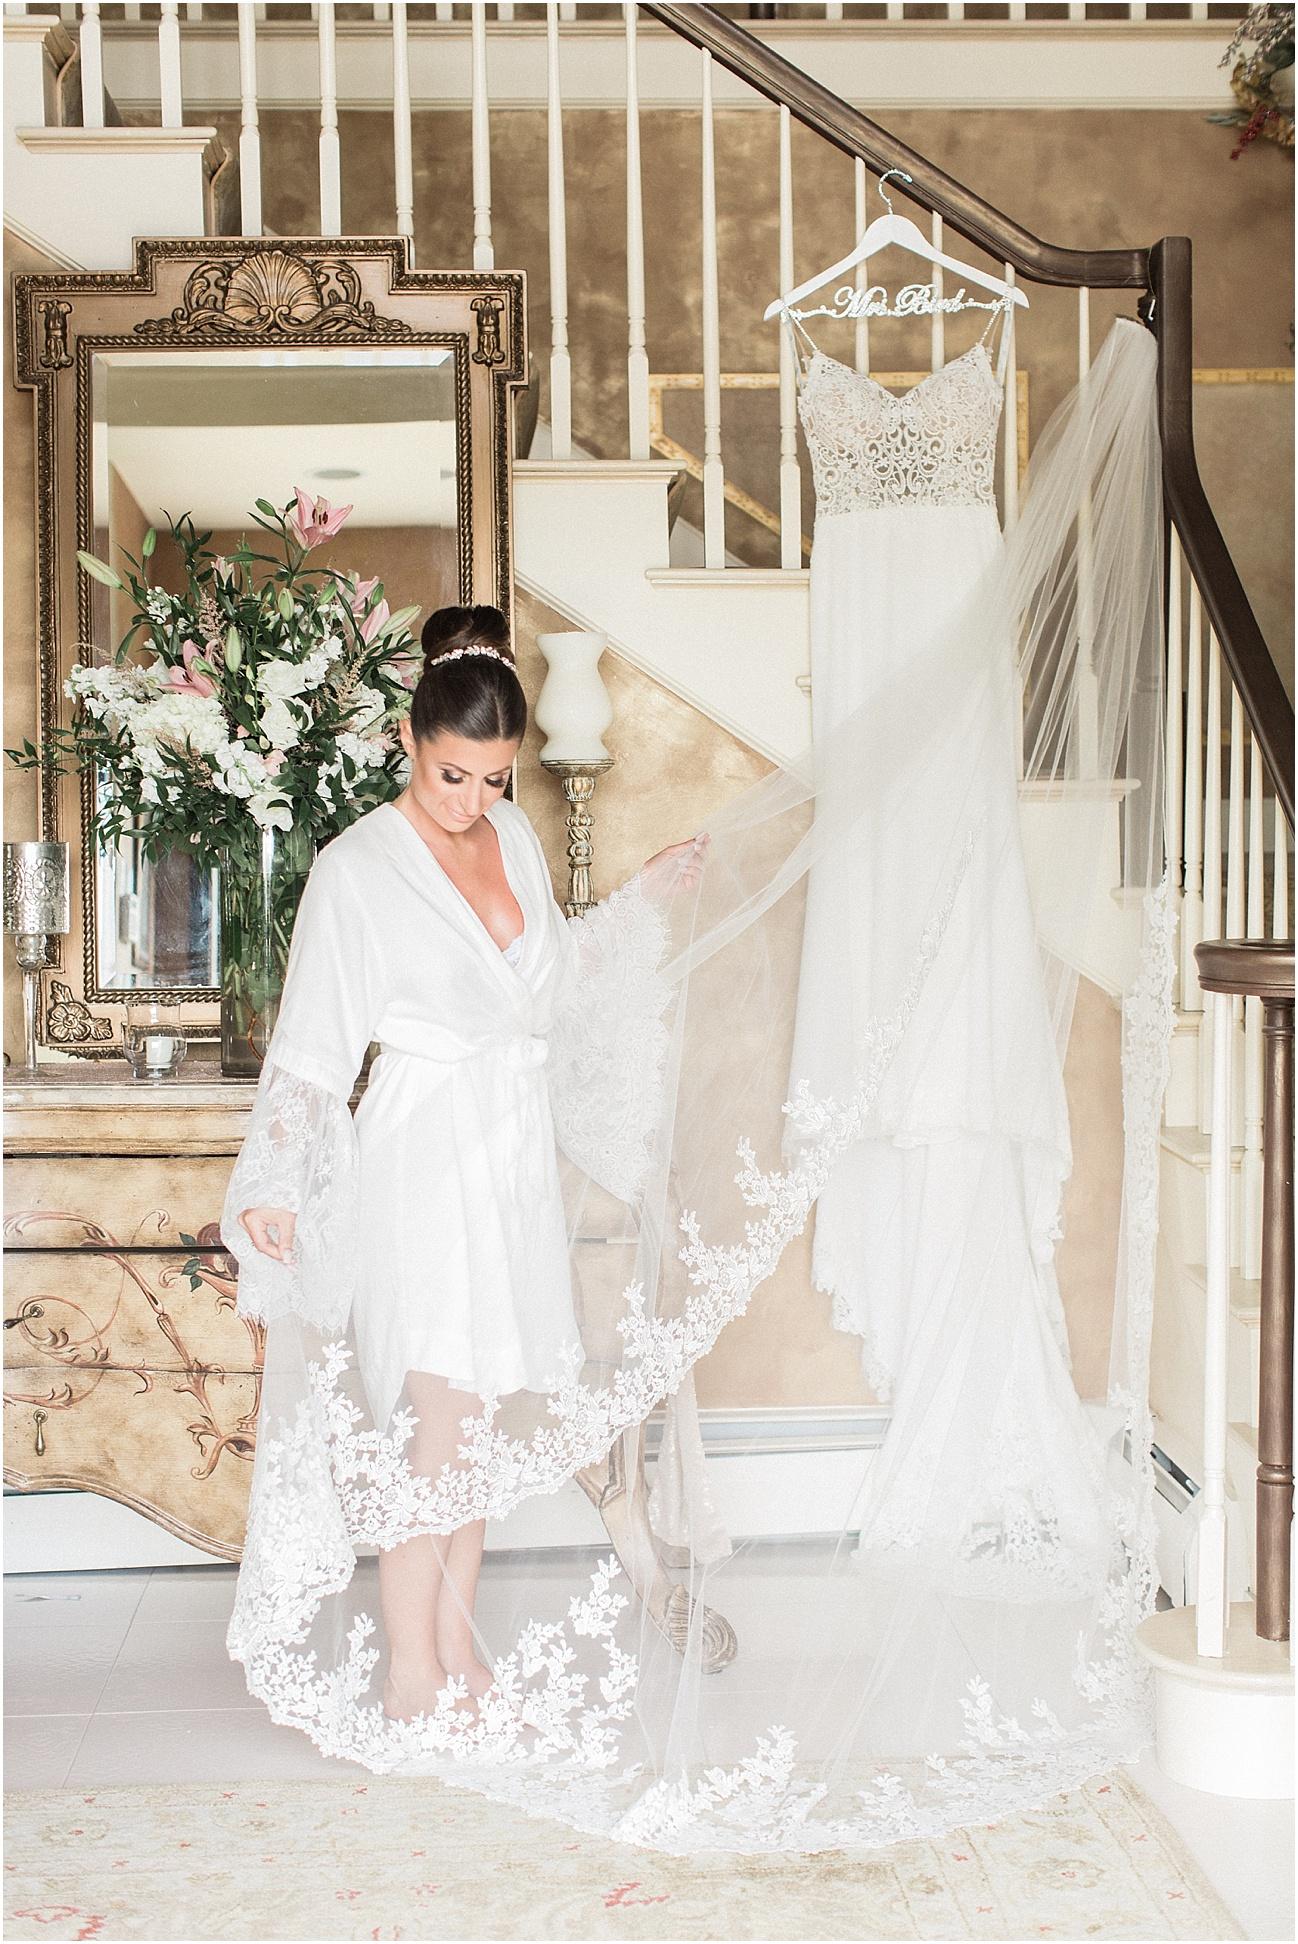 bianca_chris_danversport_italian_blush_gold_north_shore_cape_cod_boston_wedding_photographer_meredith_jane_photography_photo_1108.jpg